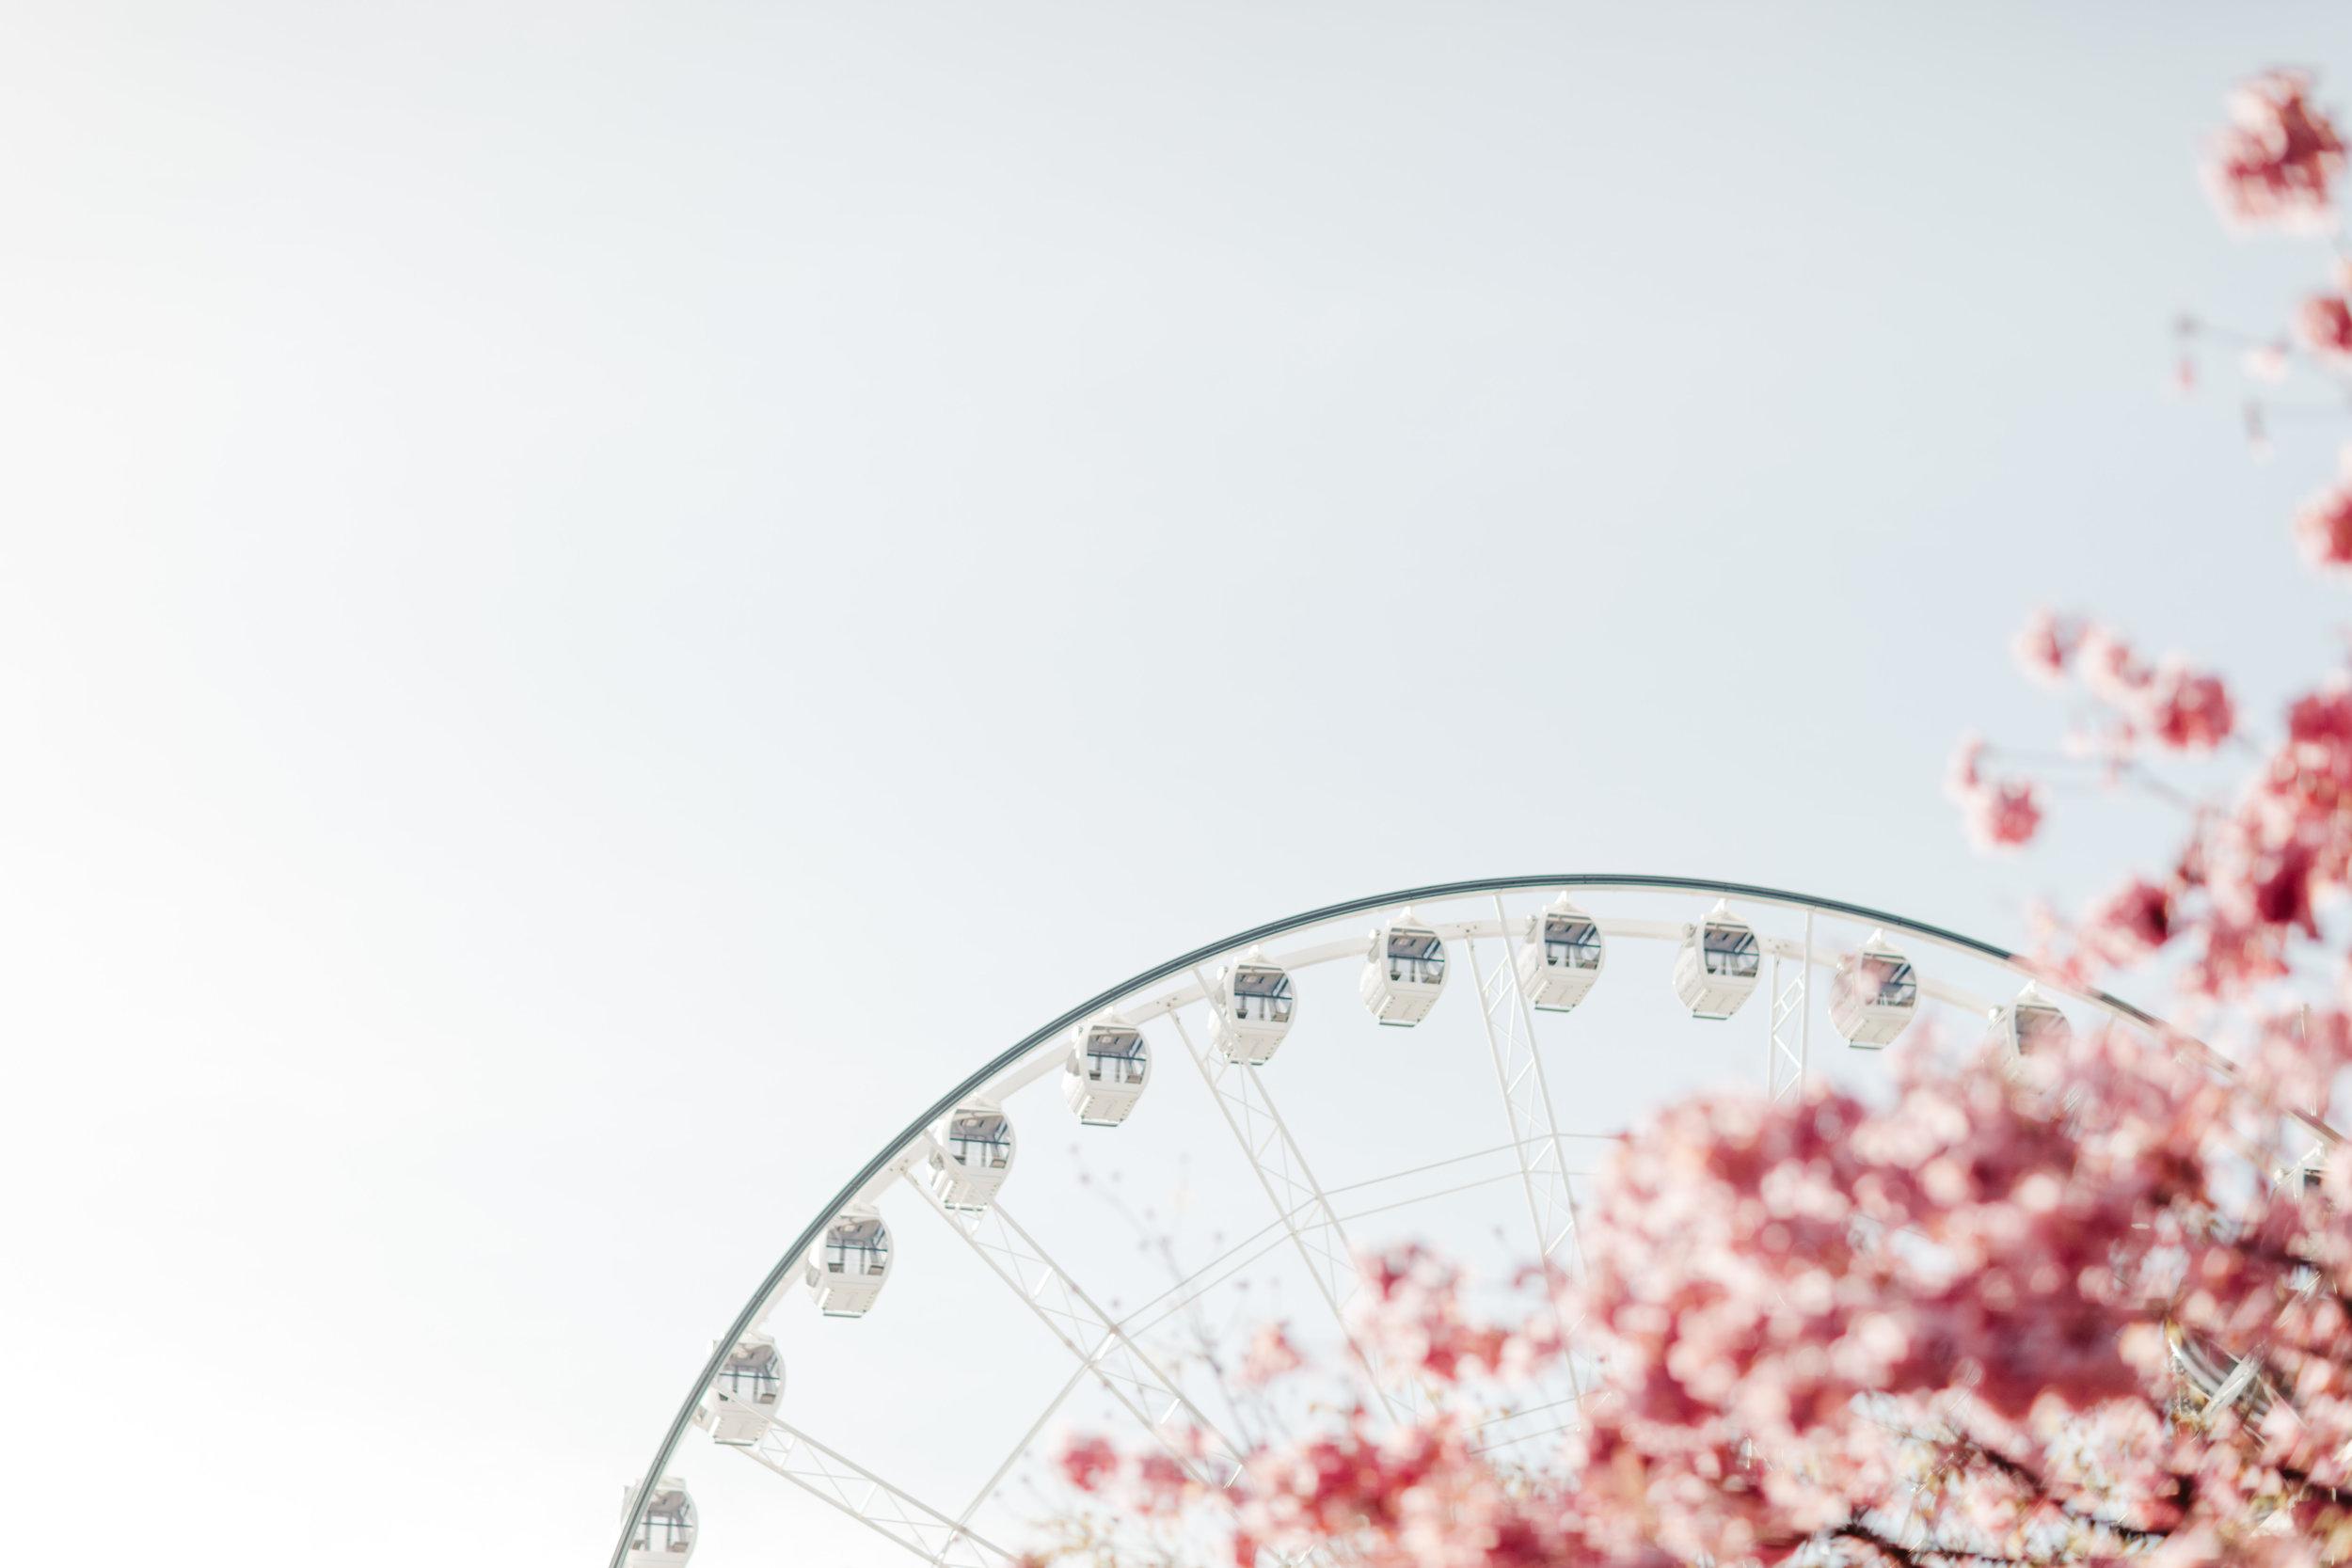 brisbane_ferris_wheel_photo_by_samantha_look.jpg